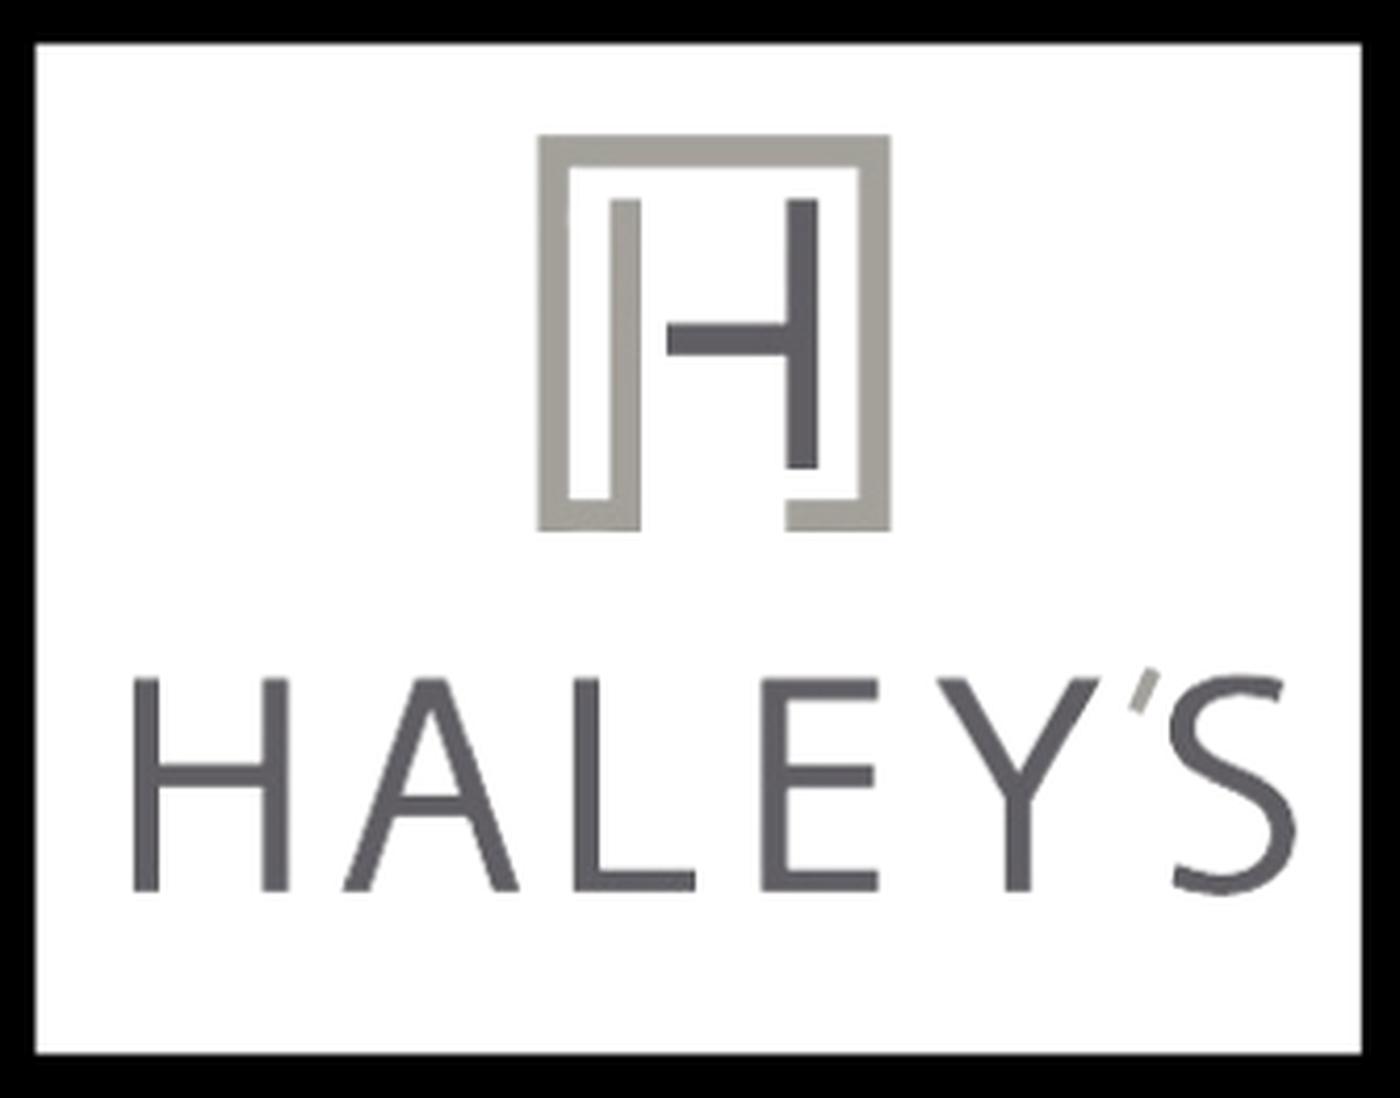 Haley's